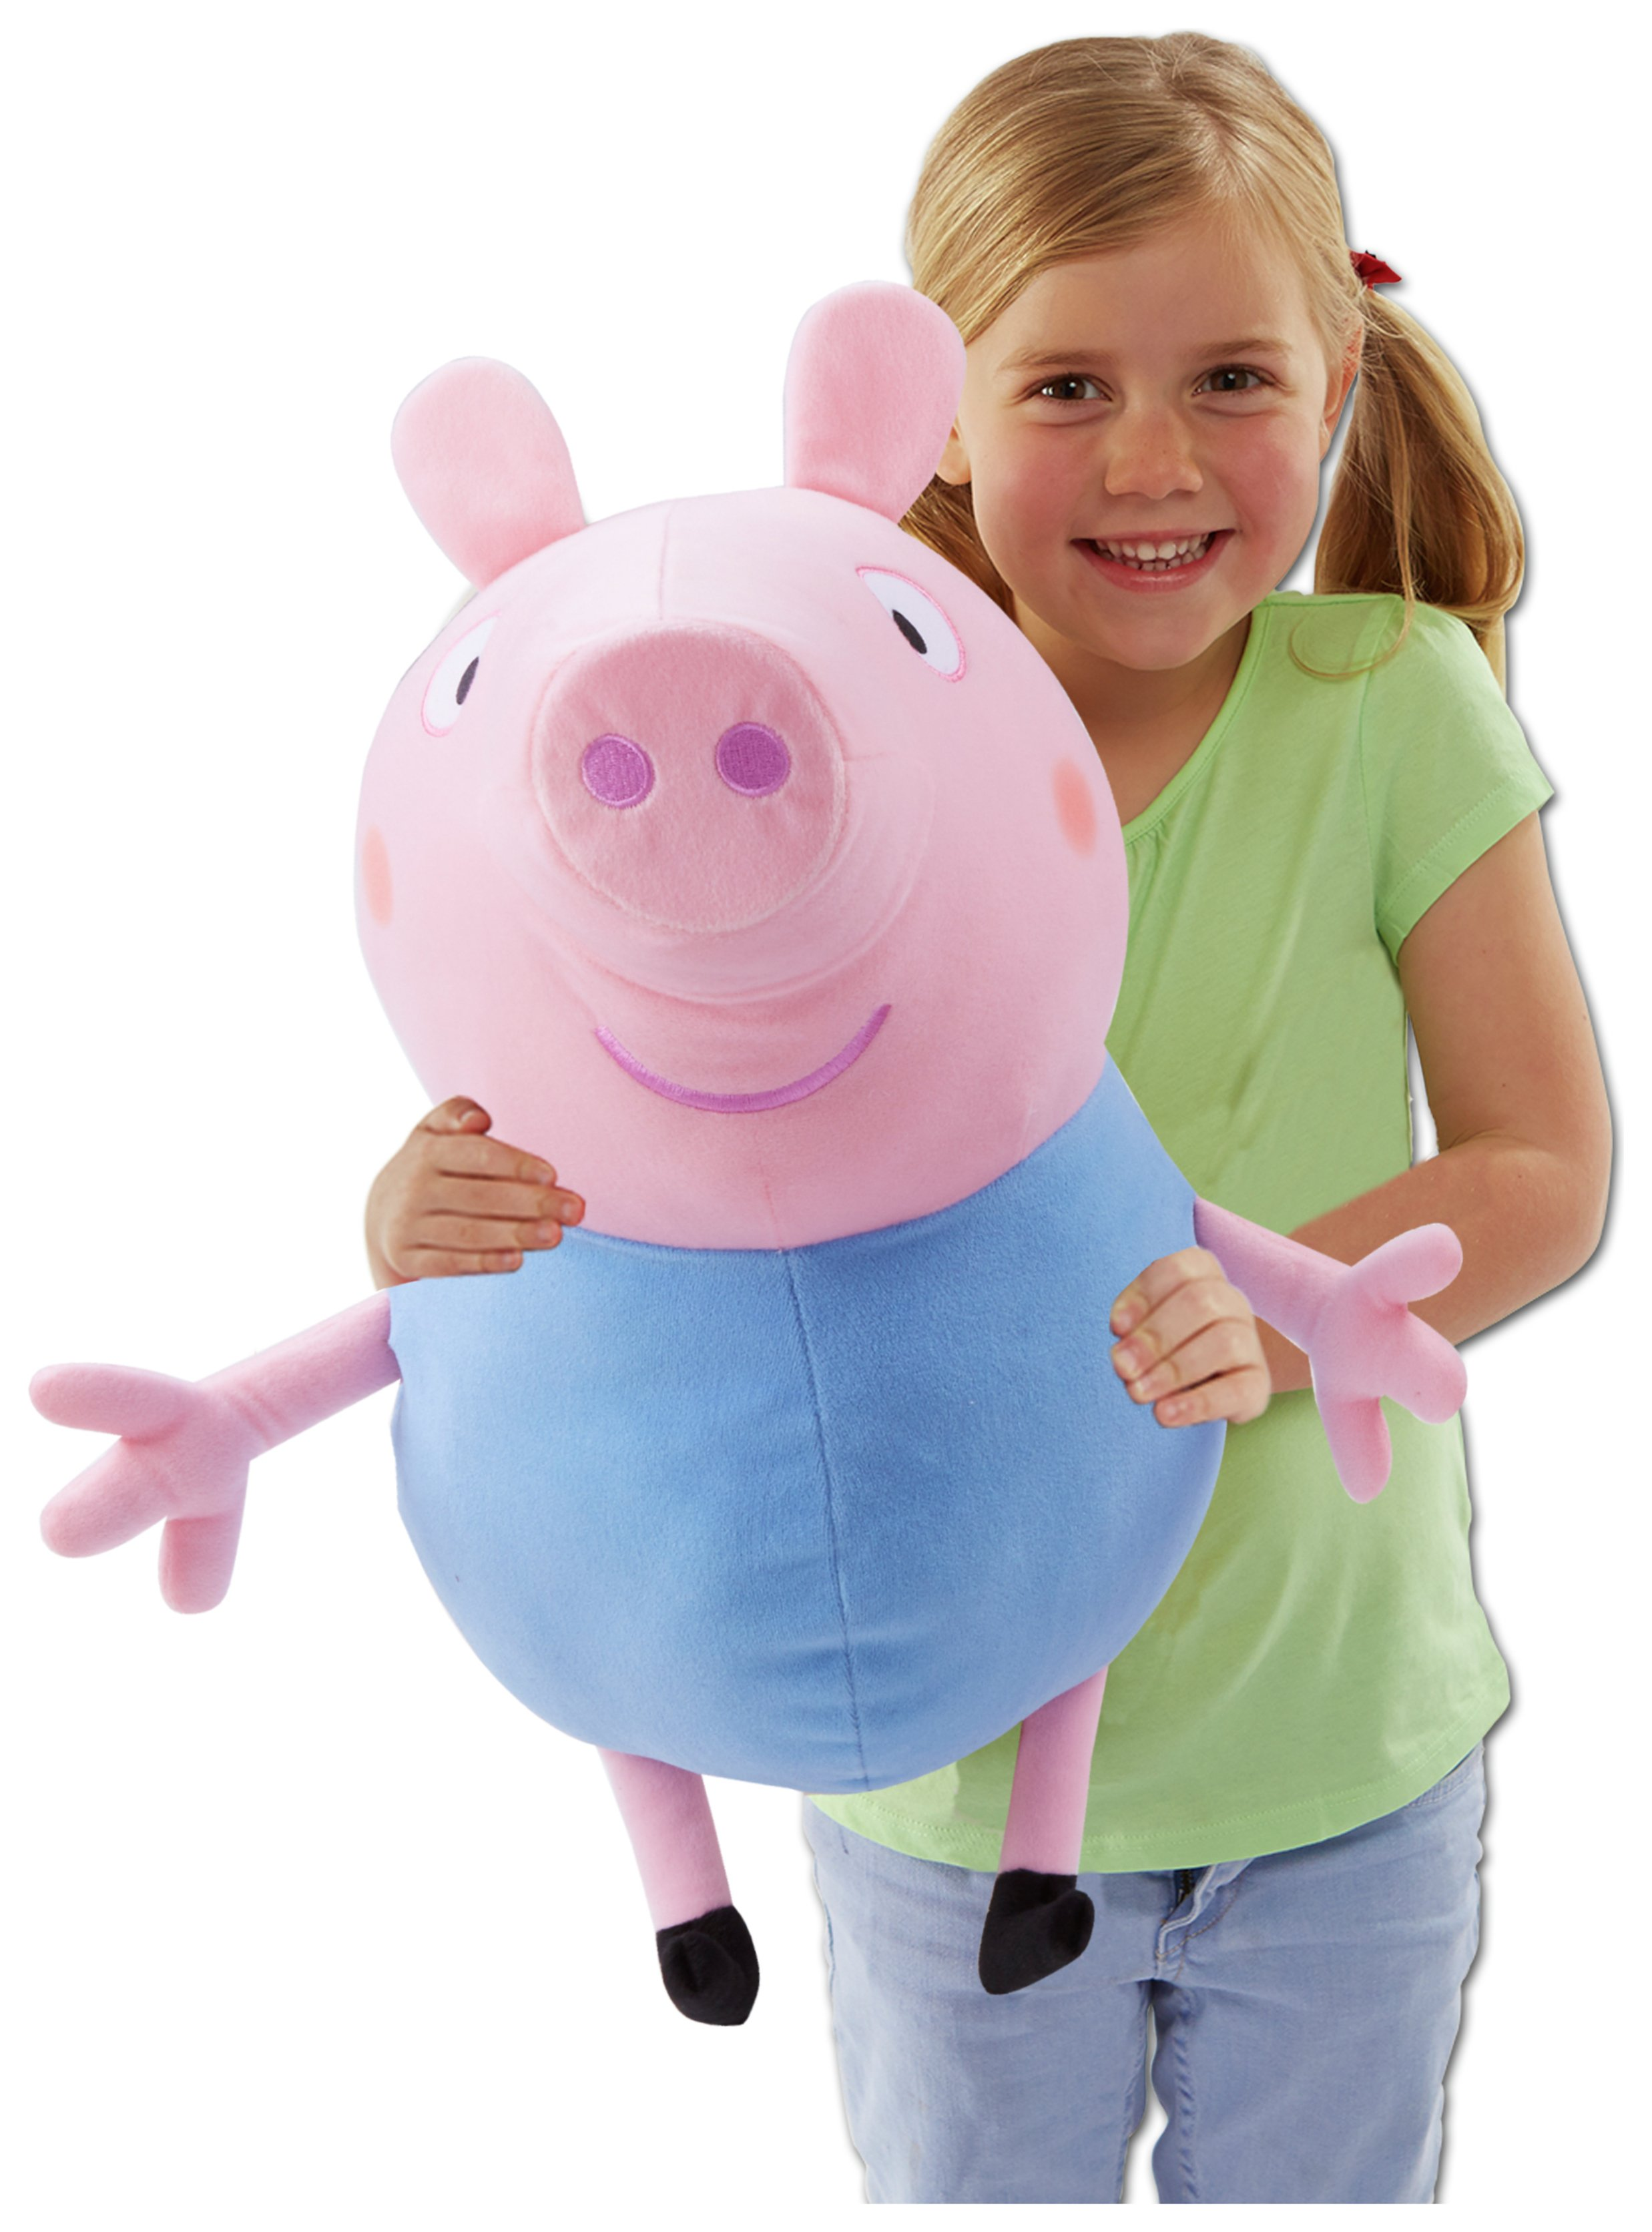 Peppa Pig Giant Talking George Soft Toy